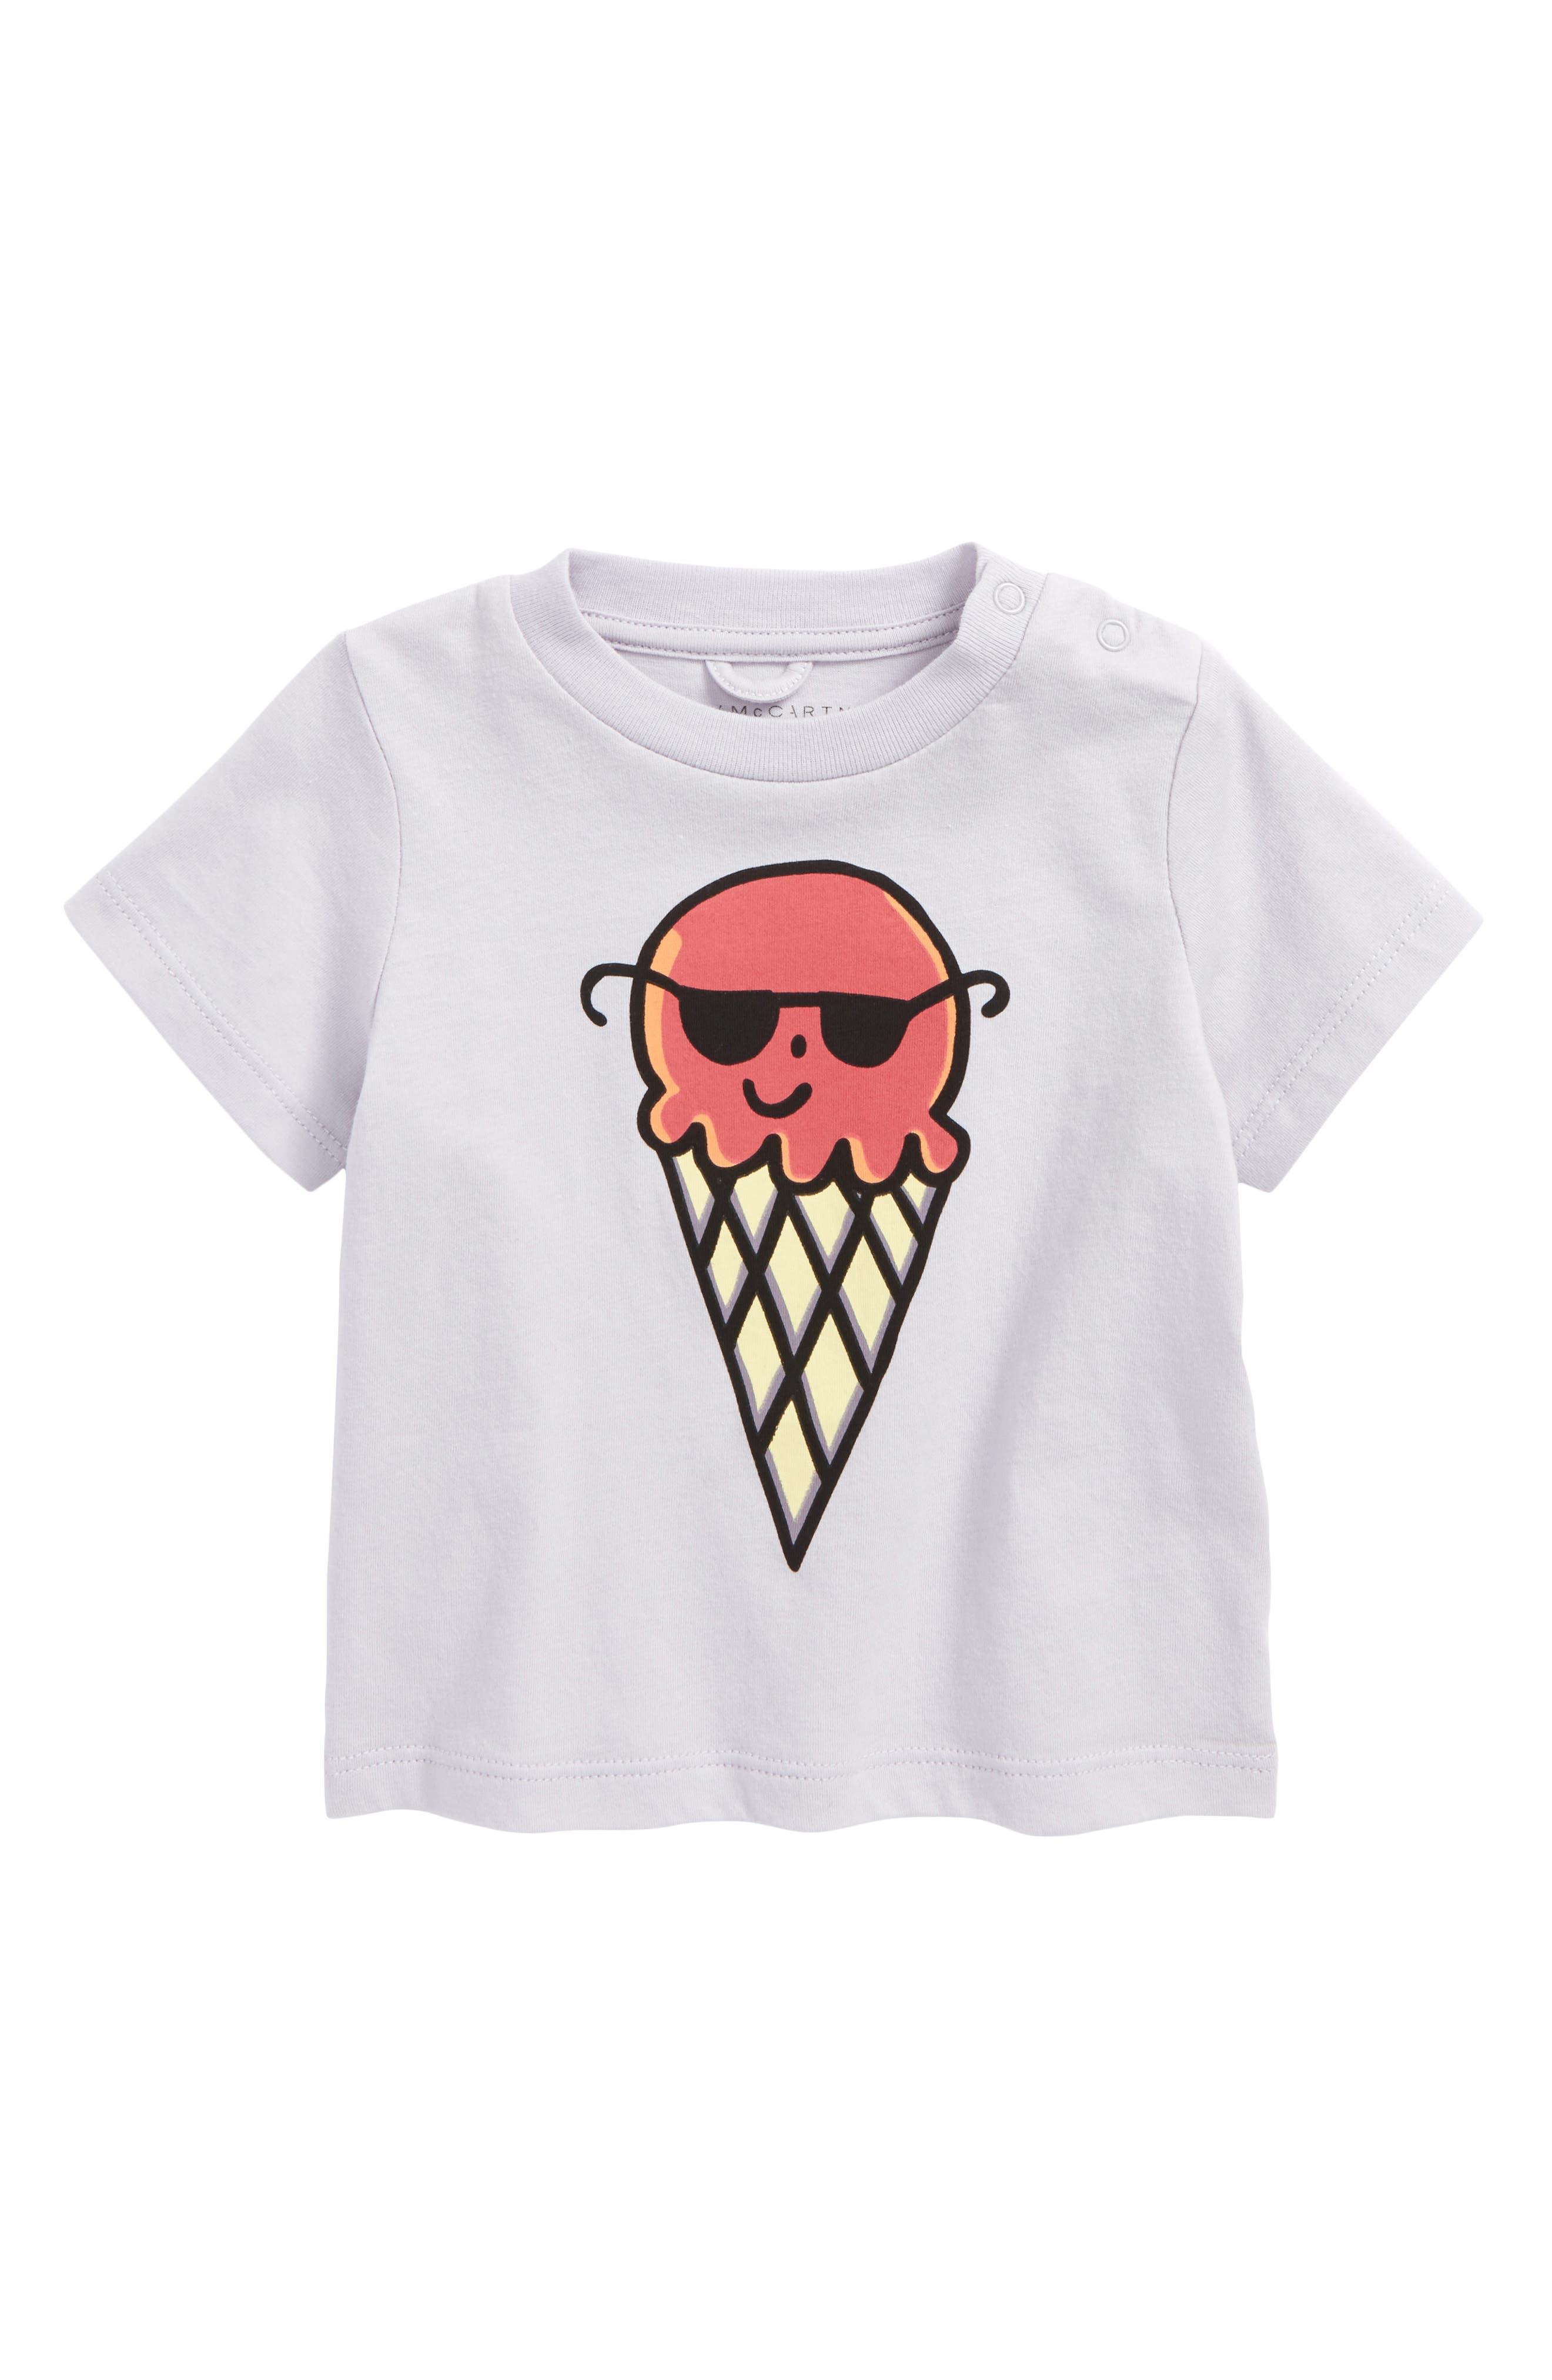 Stella McCartney Chuckle Ice Cream Cone Tee (Baby)